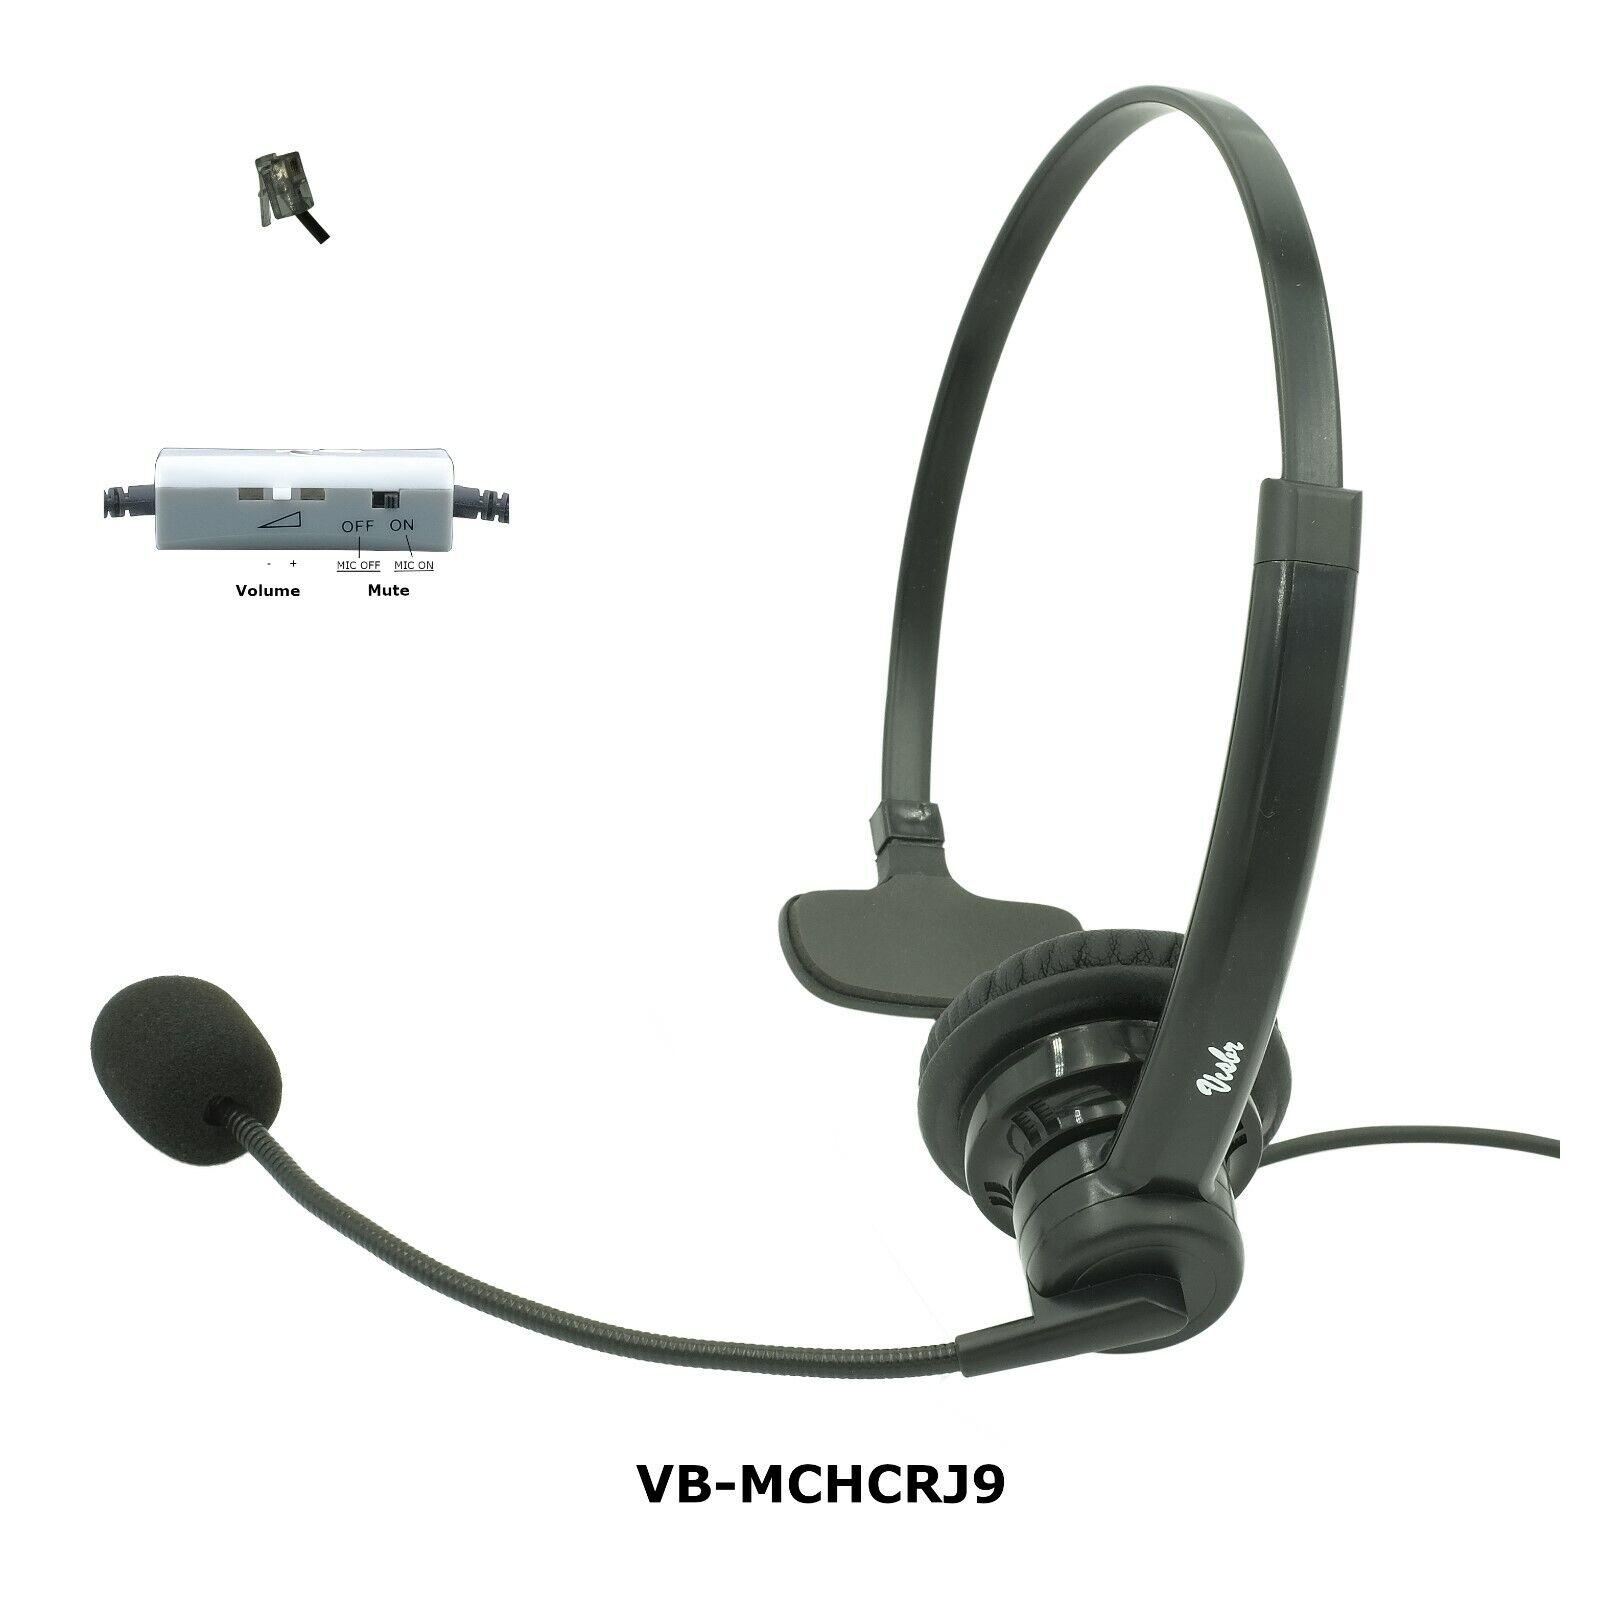 ShoreTel Phone headset, Noise Canceling Rotatable Microphone